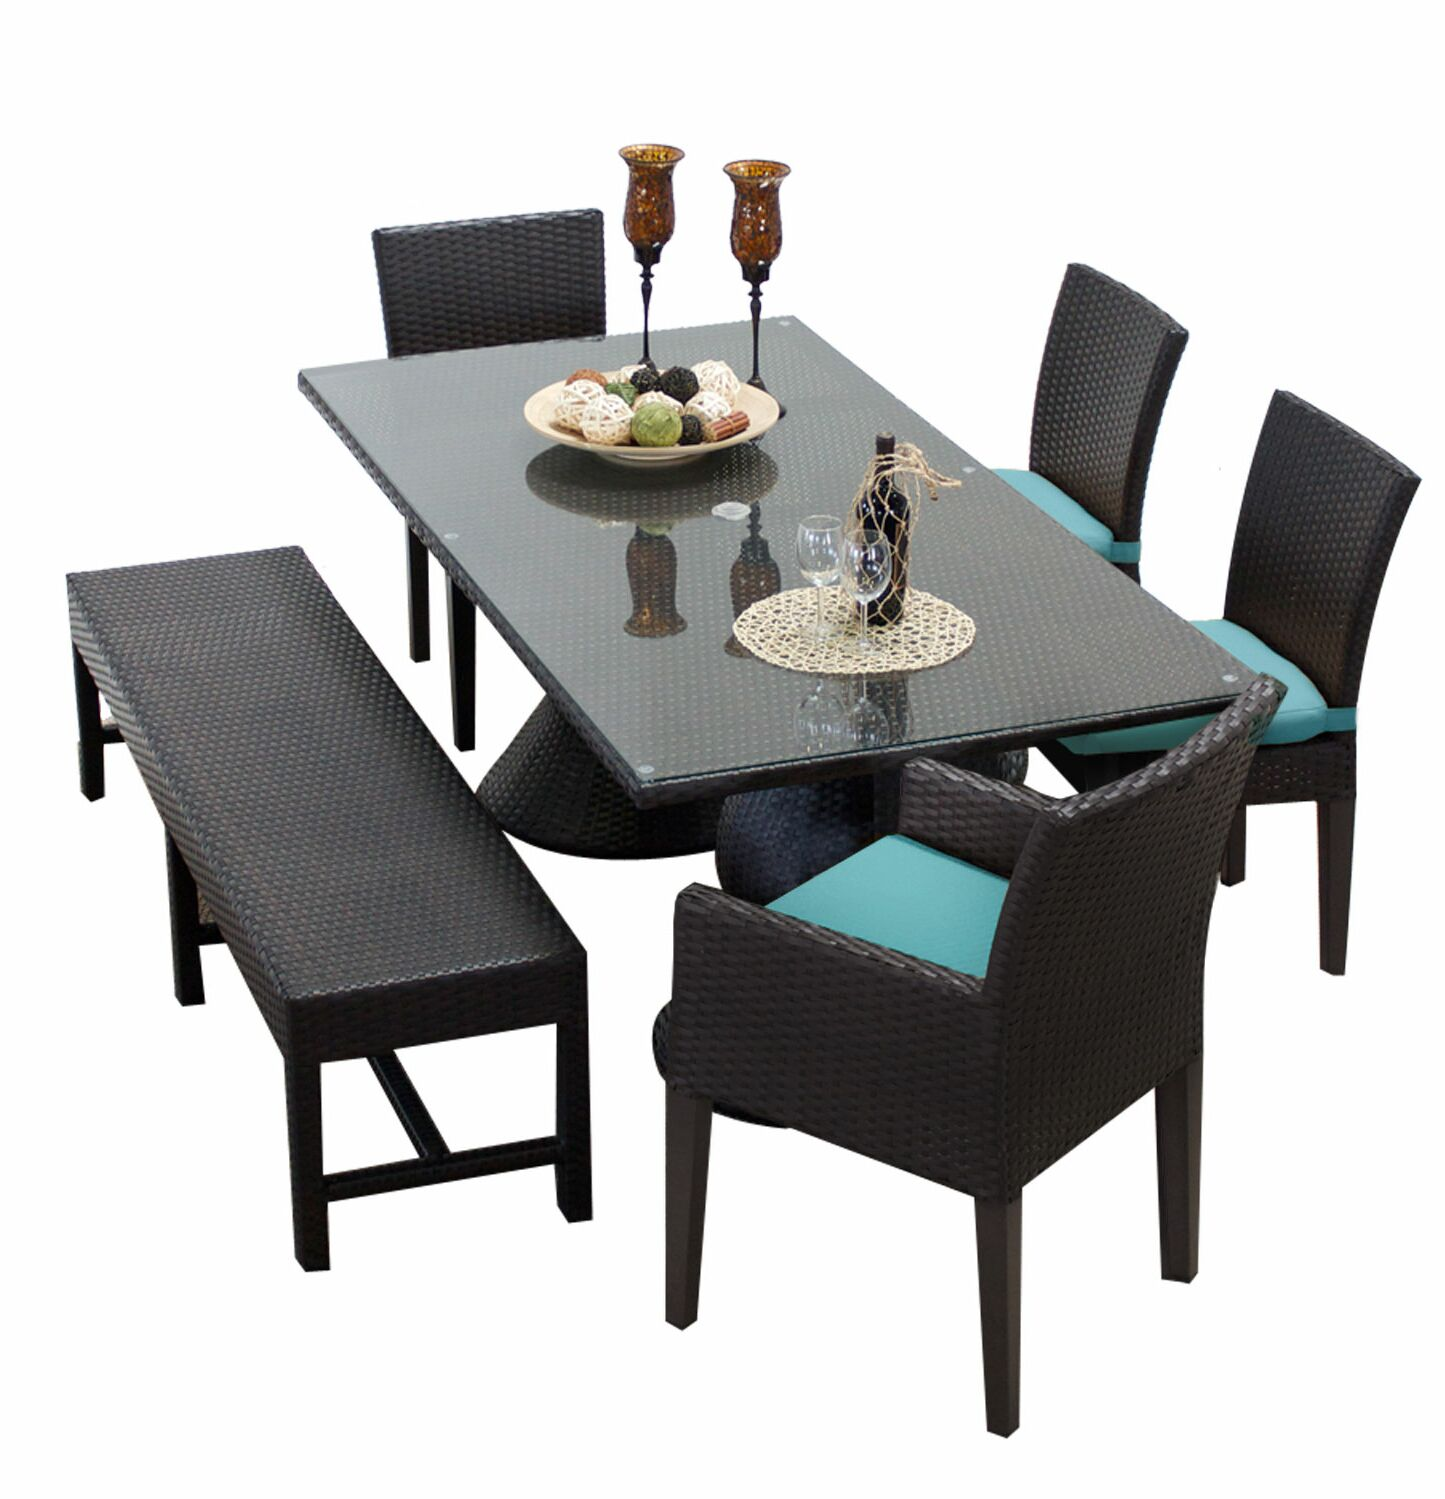 Napa 6 Piece Dining Set with Cushions Cushion Color: Aruba